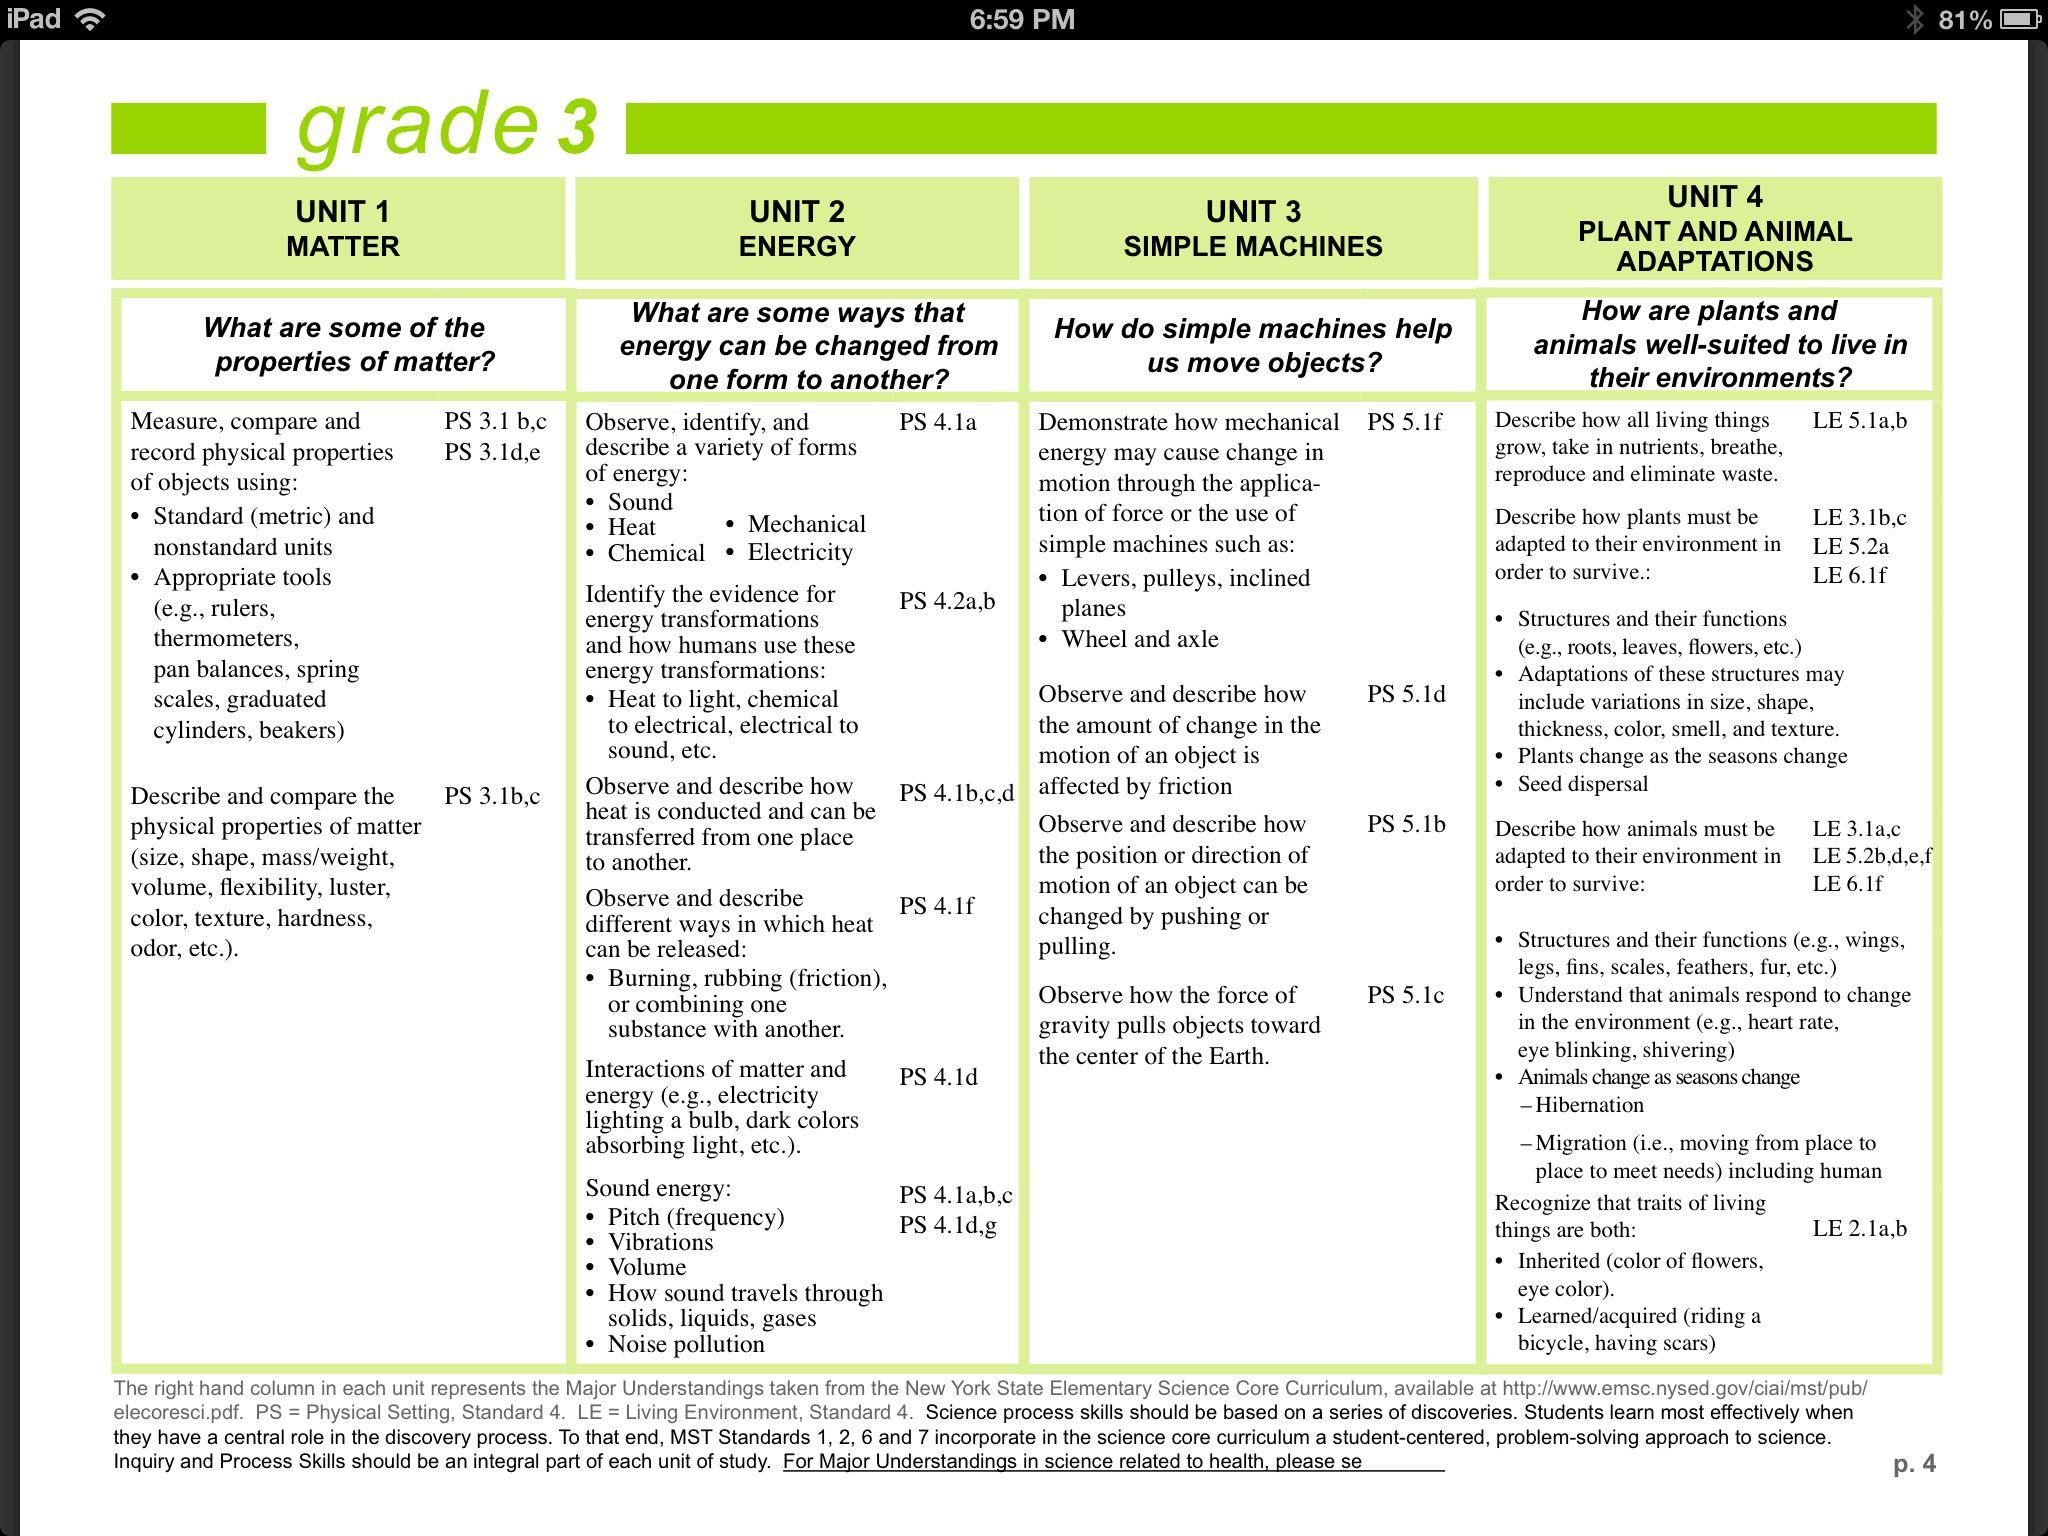 http//schools.nyc.gov/documents/stem/science/k8sciencess